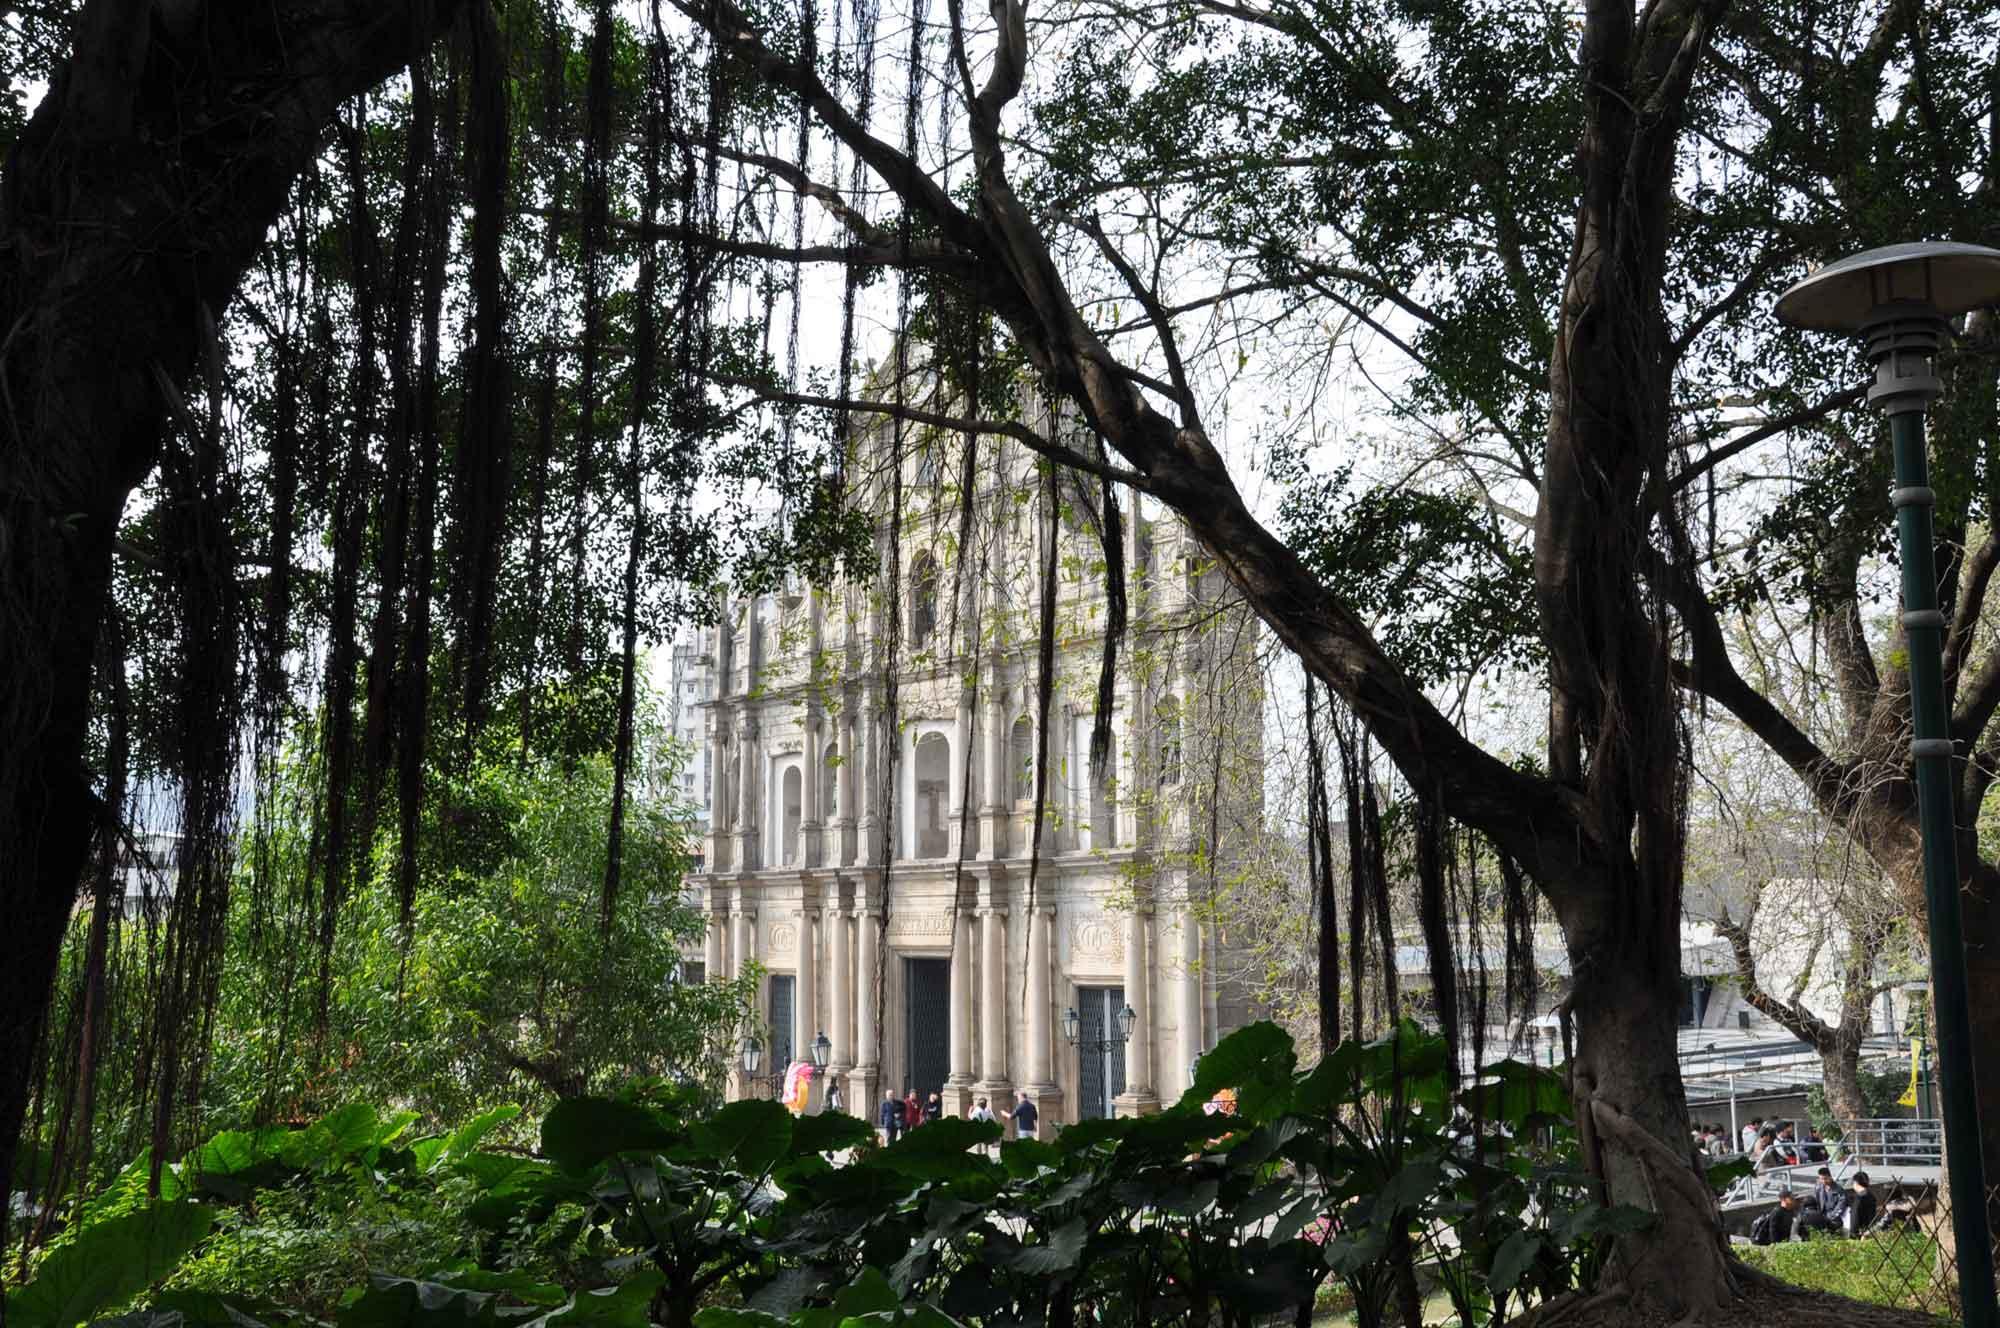 View of St. Paul's Macau through trees